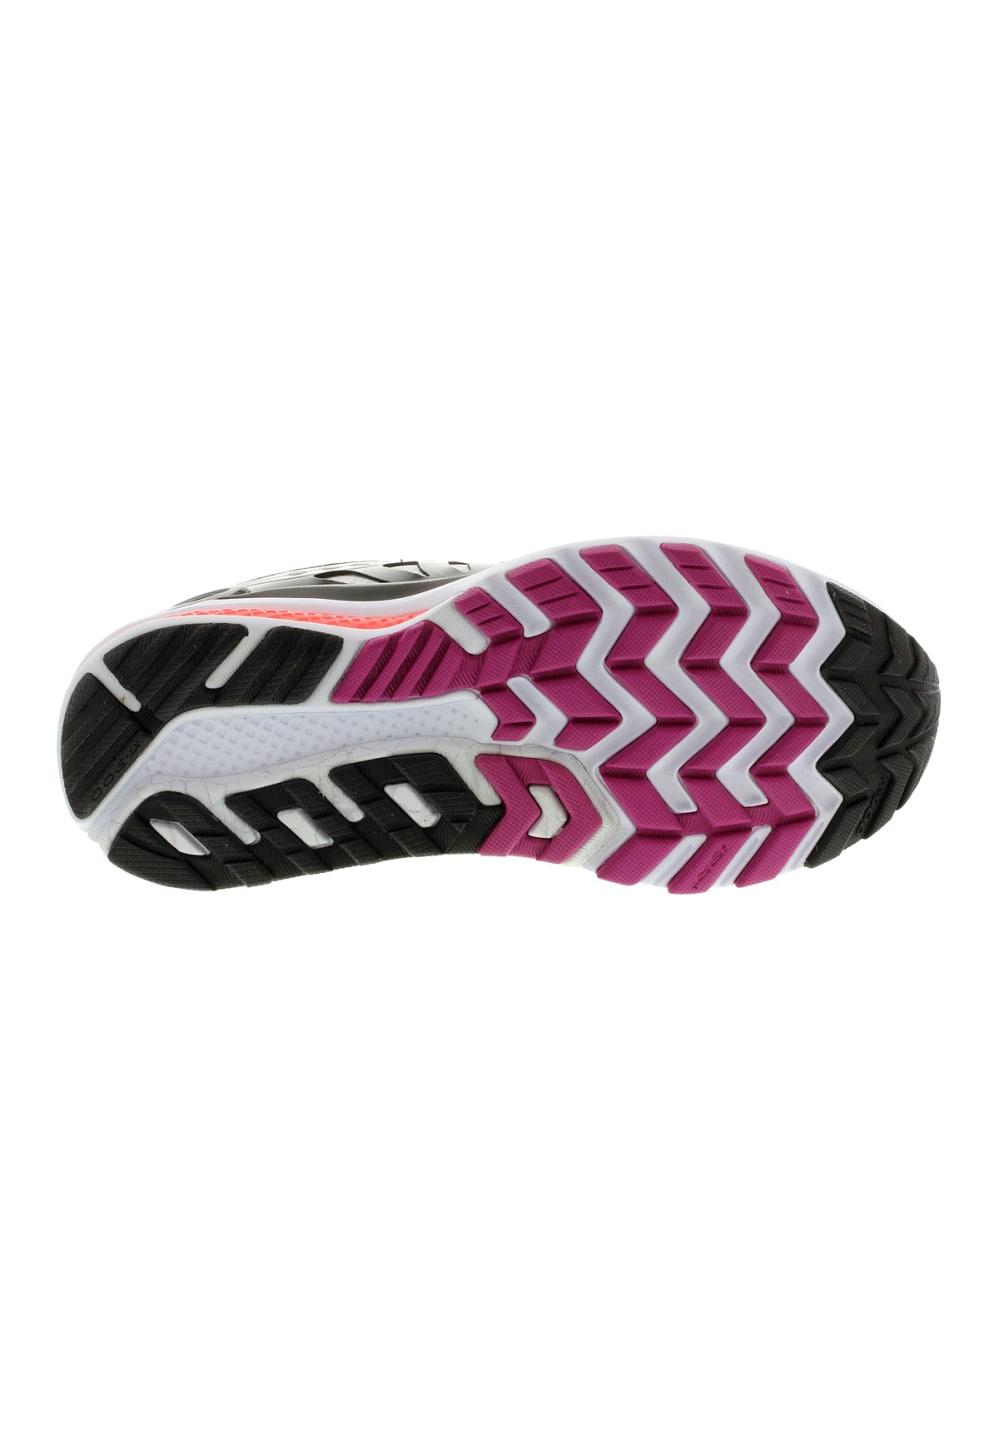 71b8f5b7 Saucony Hurricane Iso 2 - Running shoes for Women - Black